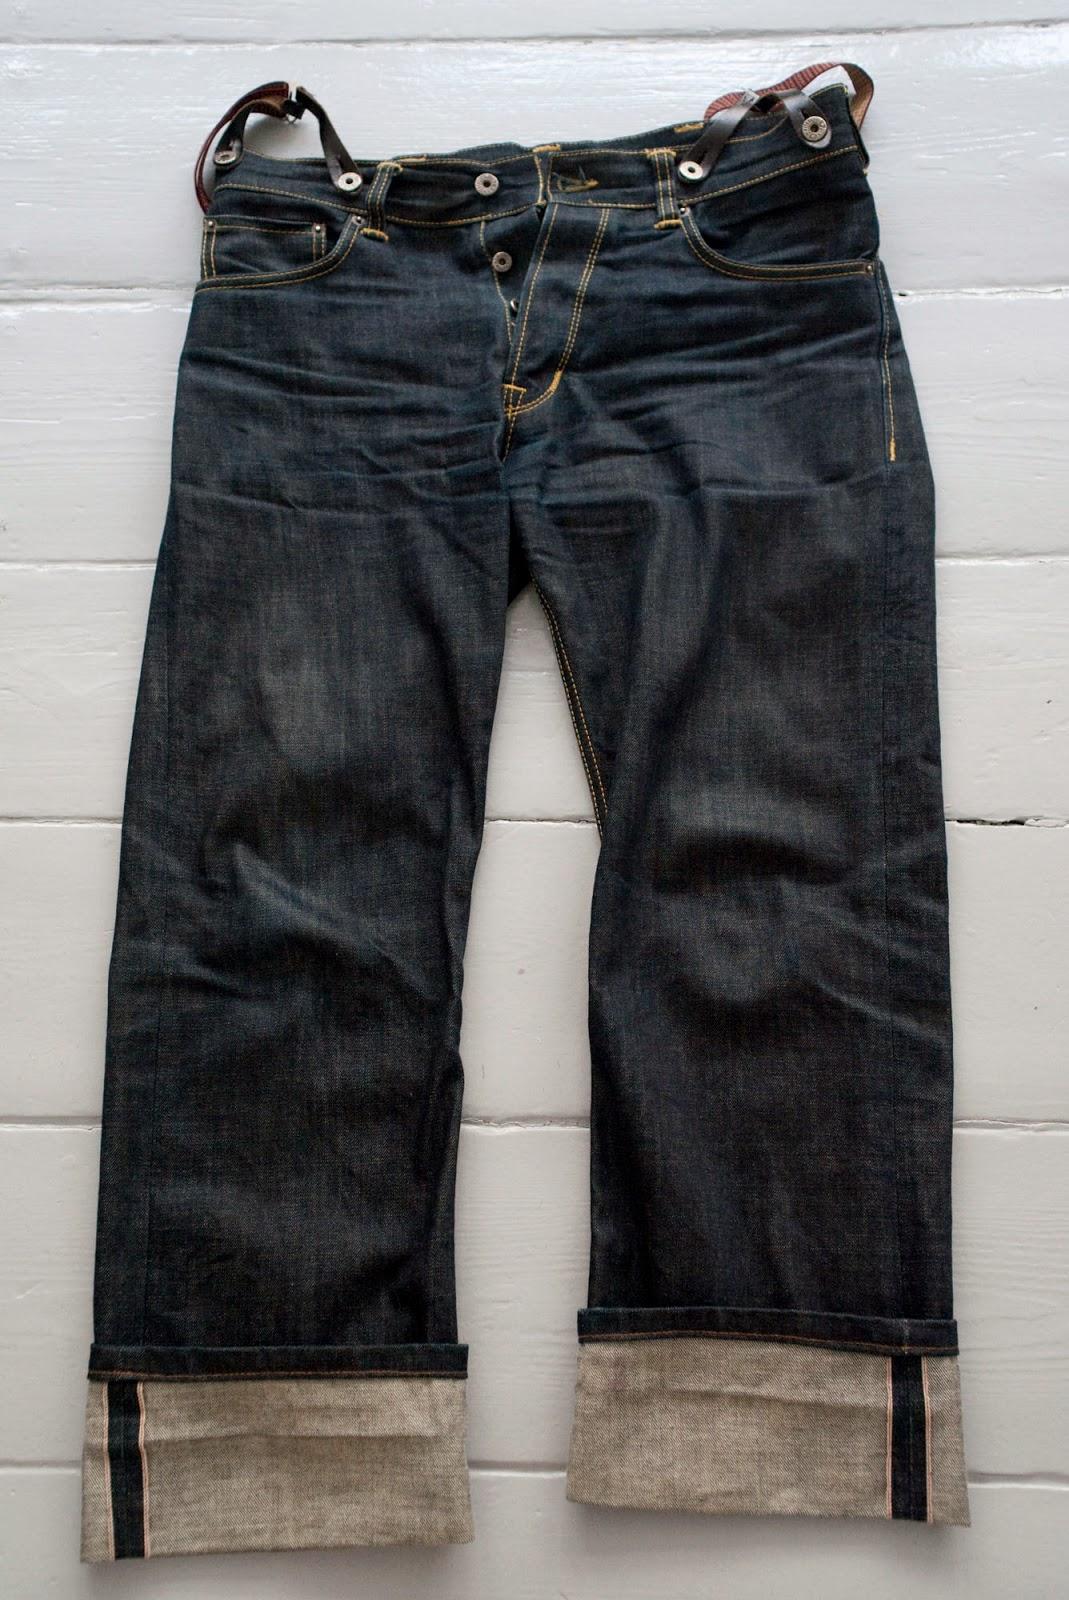 pike brothers 1937 roamer jeans new utility. Black Bedroom Furniture Sets. Home Design Ideas